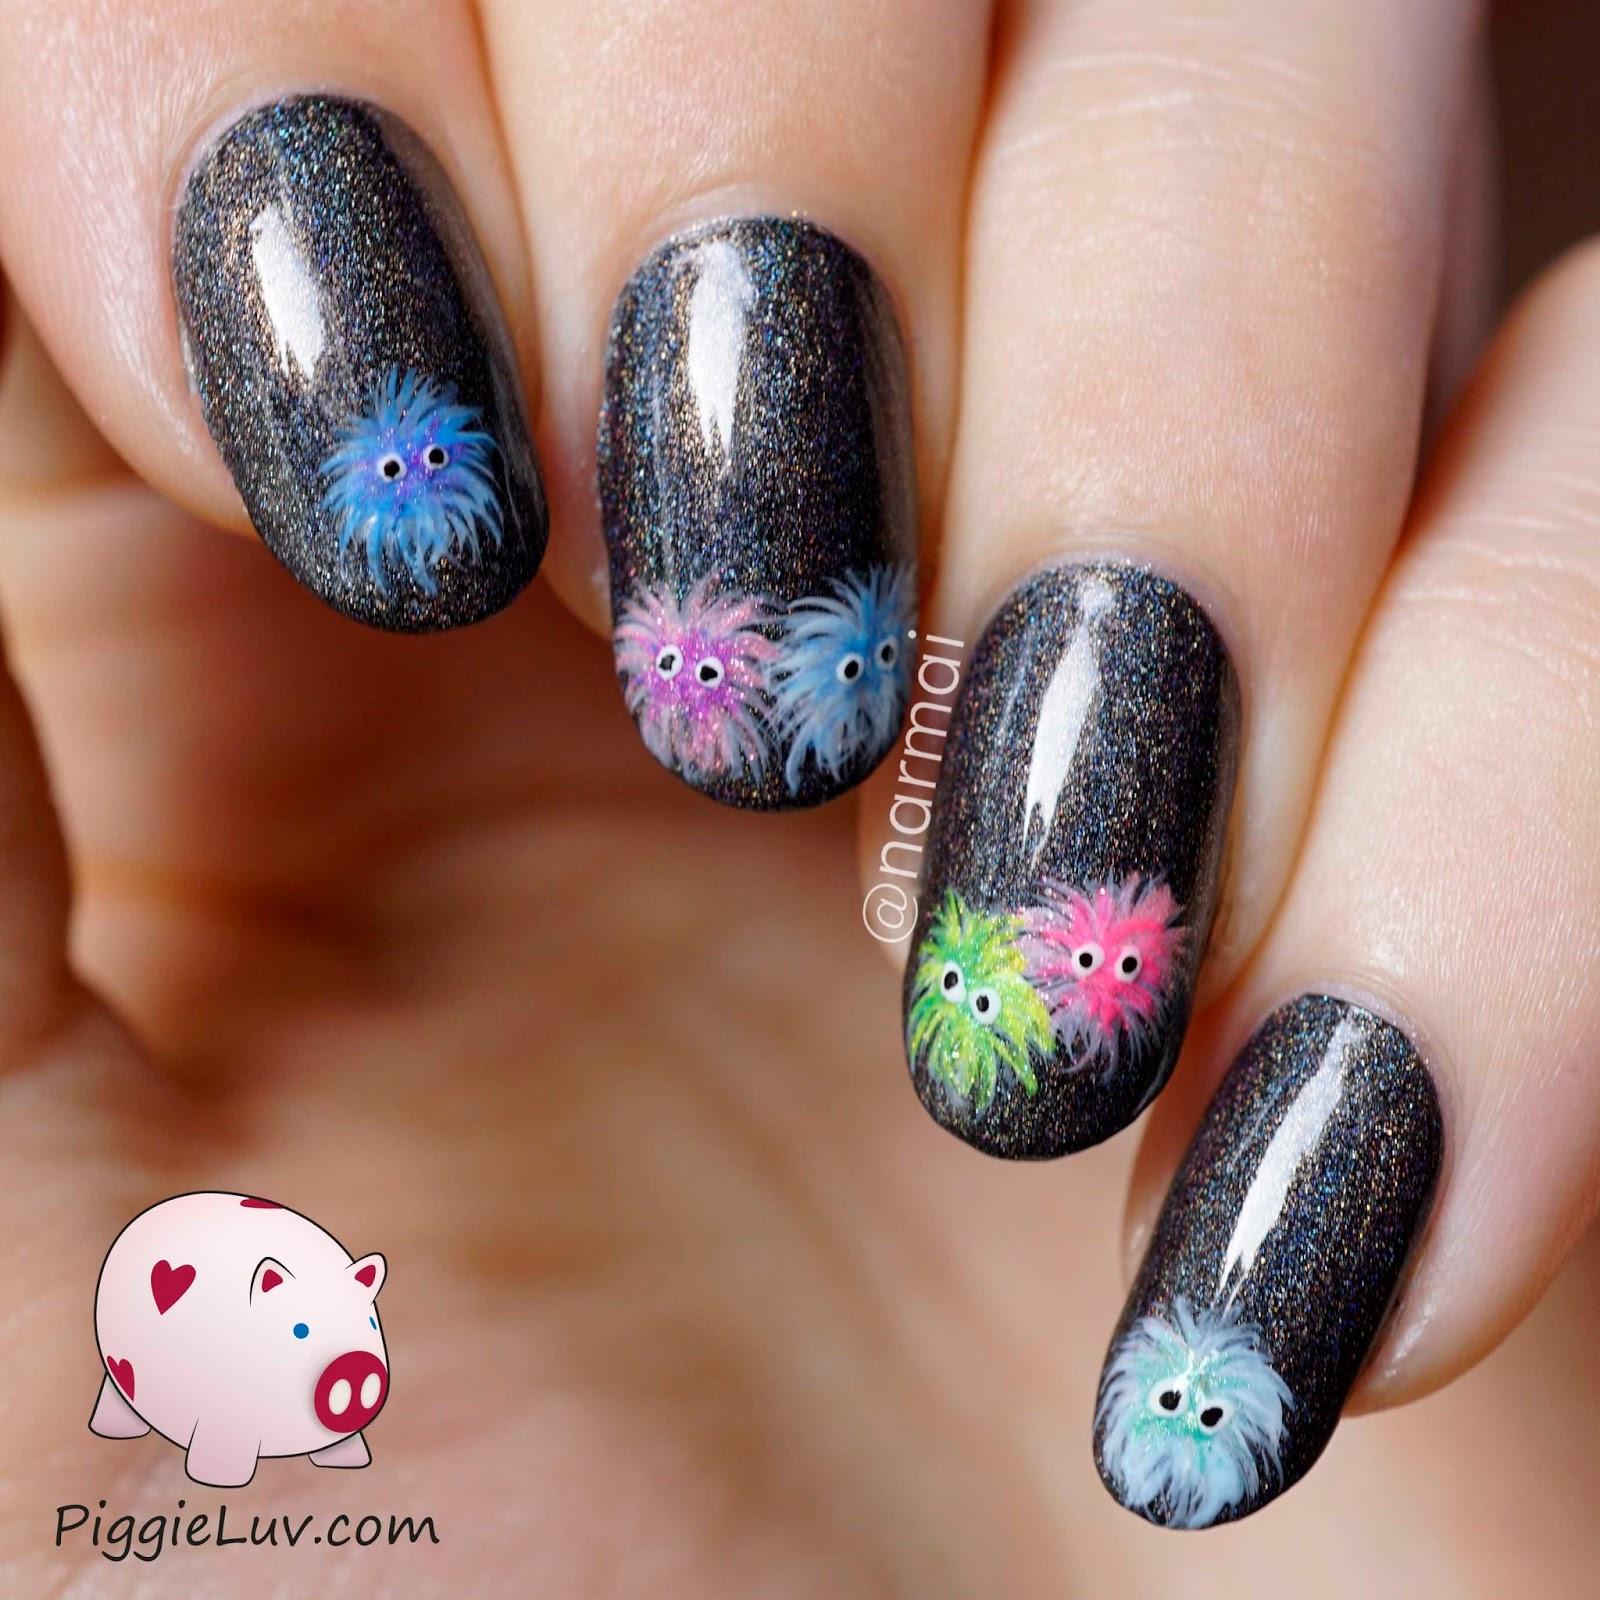 Piggieluv Rainbow Bubbles Nail Art: PiggieLuv: Rainbow Soot Sprites Nail Art